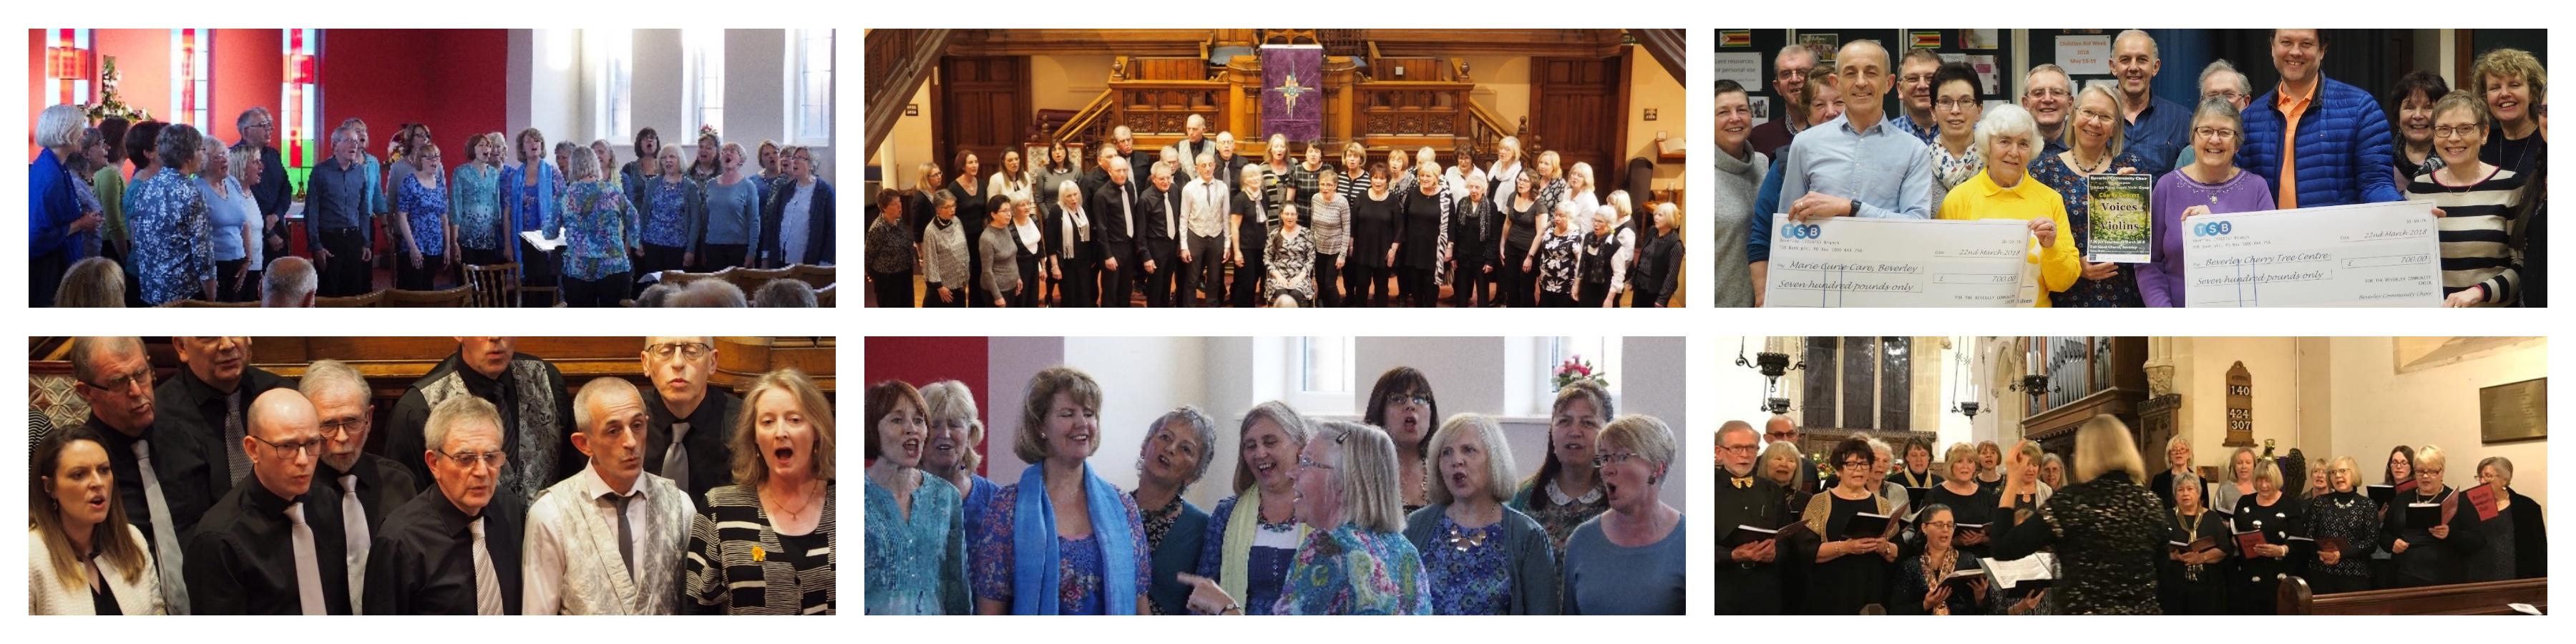 Beverley Community Choir